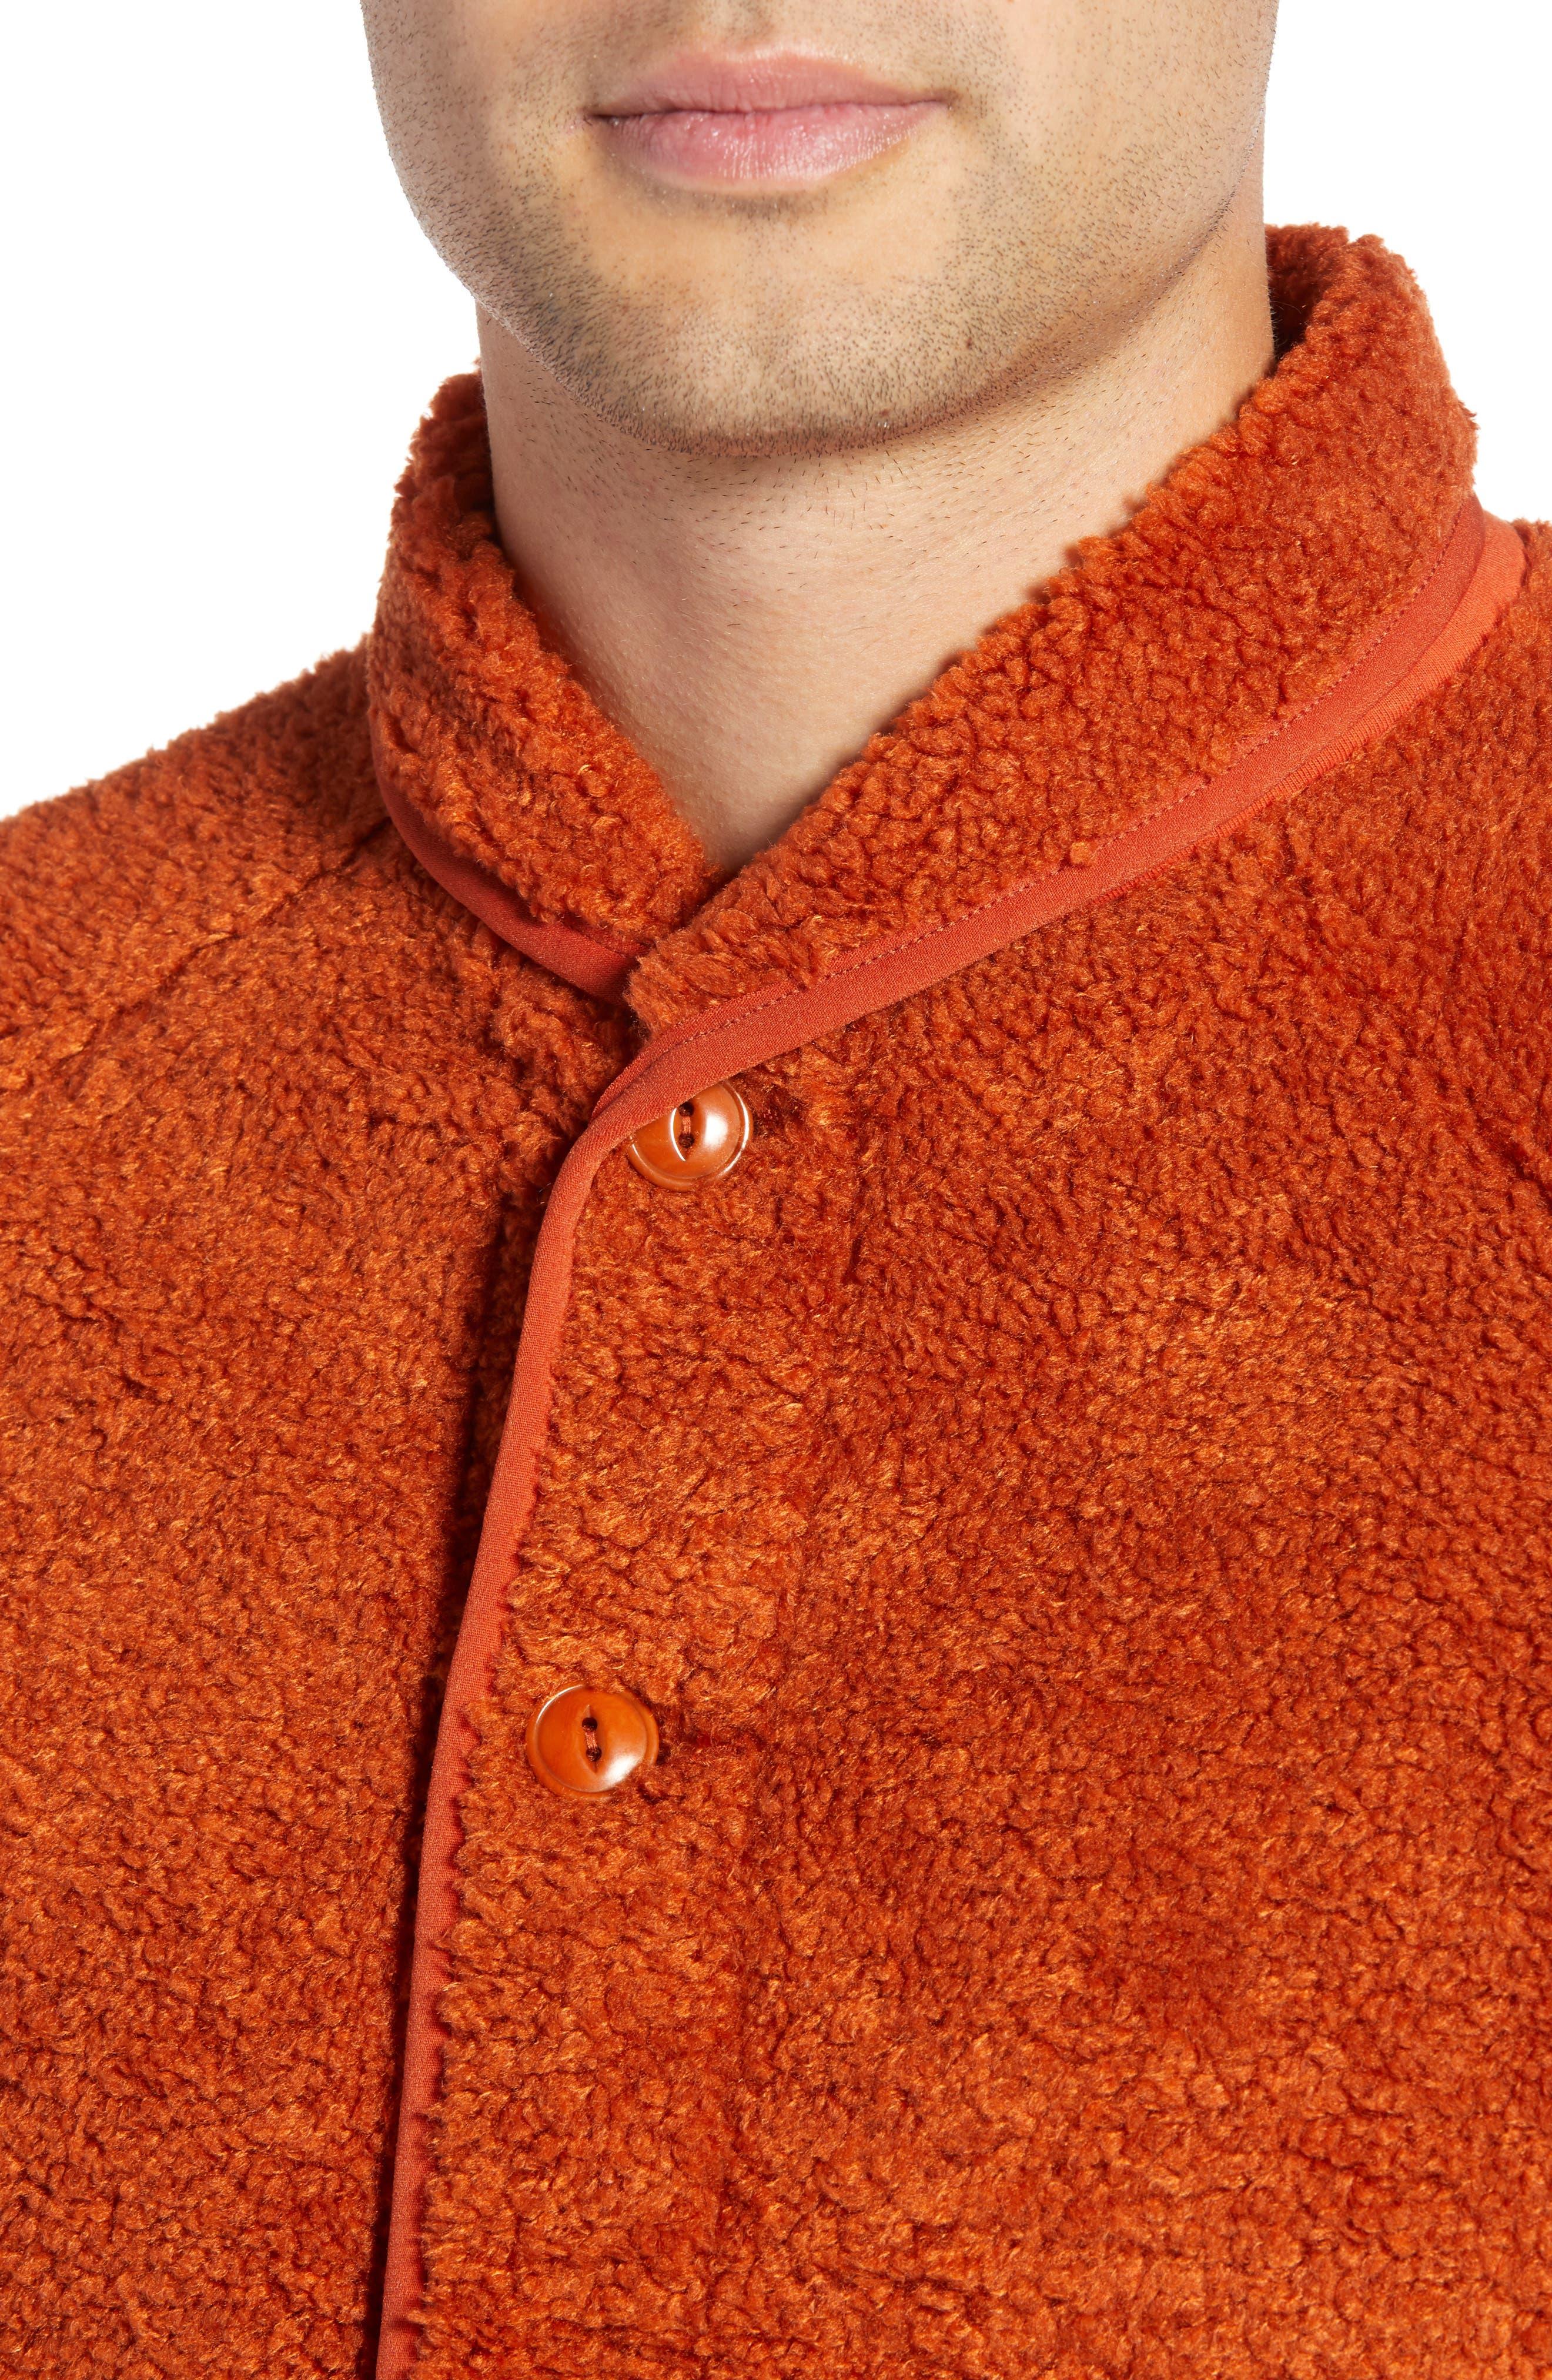 Beach Fleece Jacket,                             Alternate thumbnail 4, color,                             600